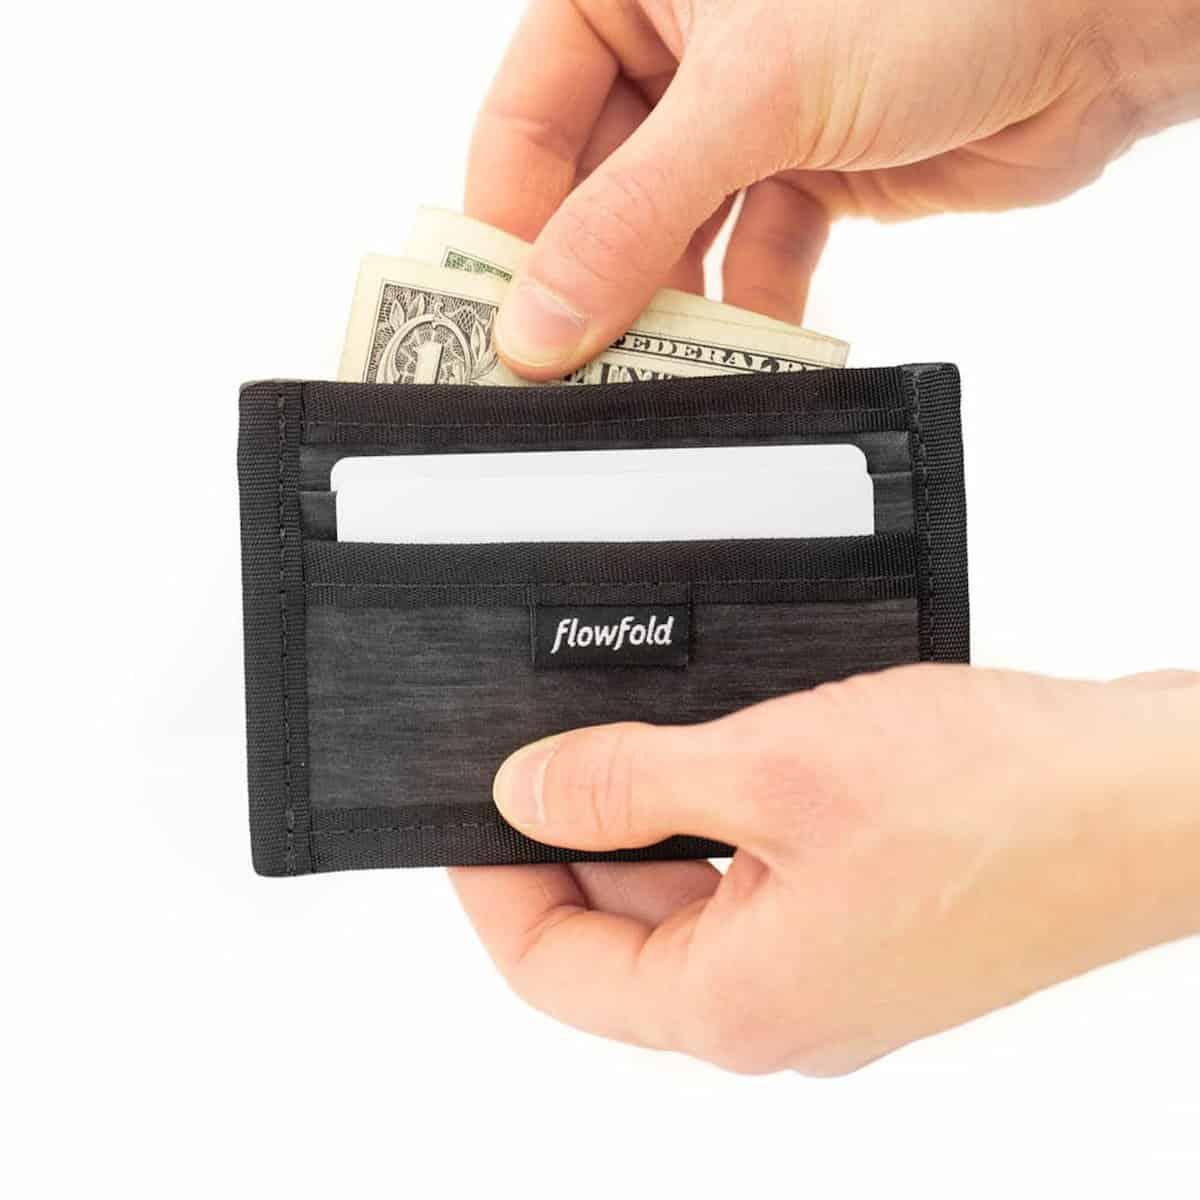 Flowfold Founder Card Holder Wallet